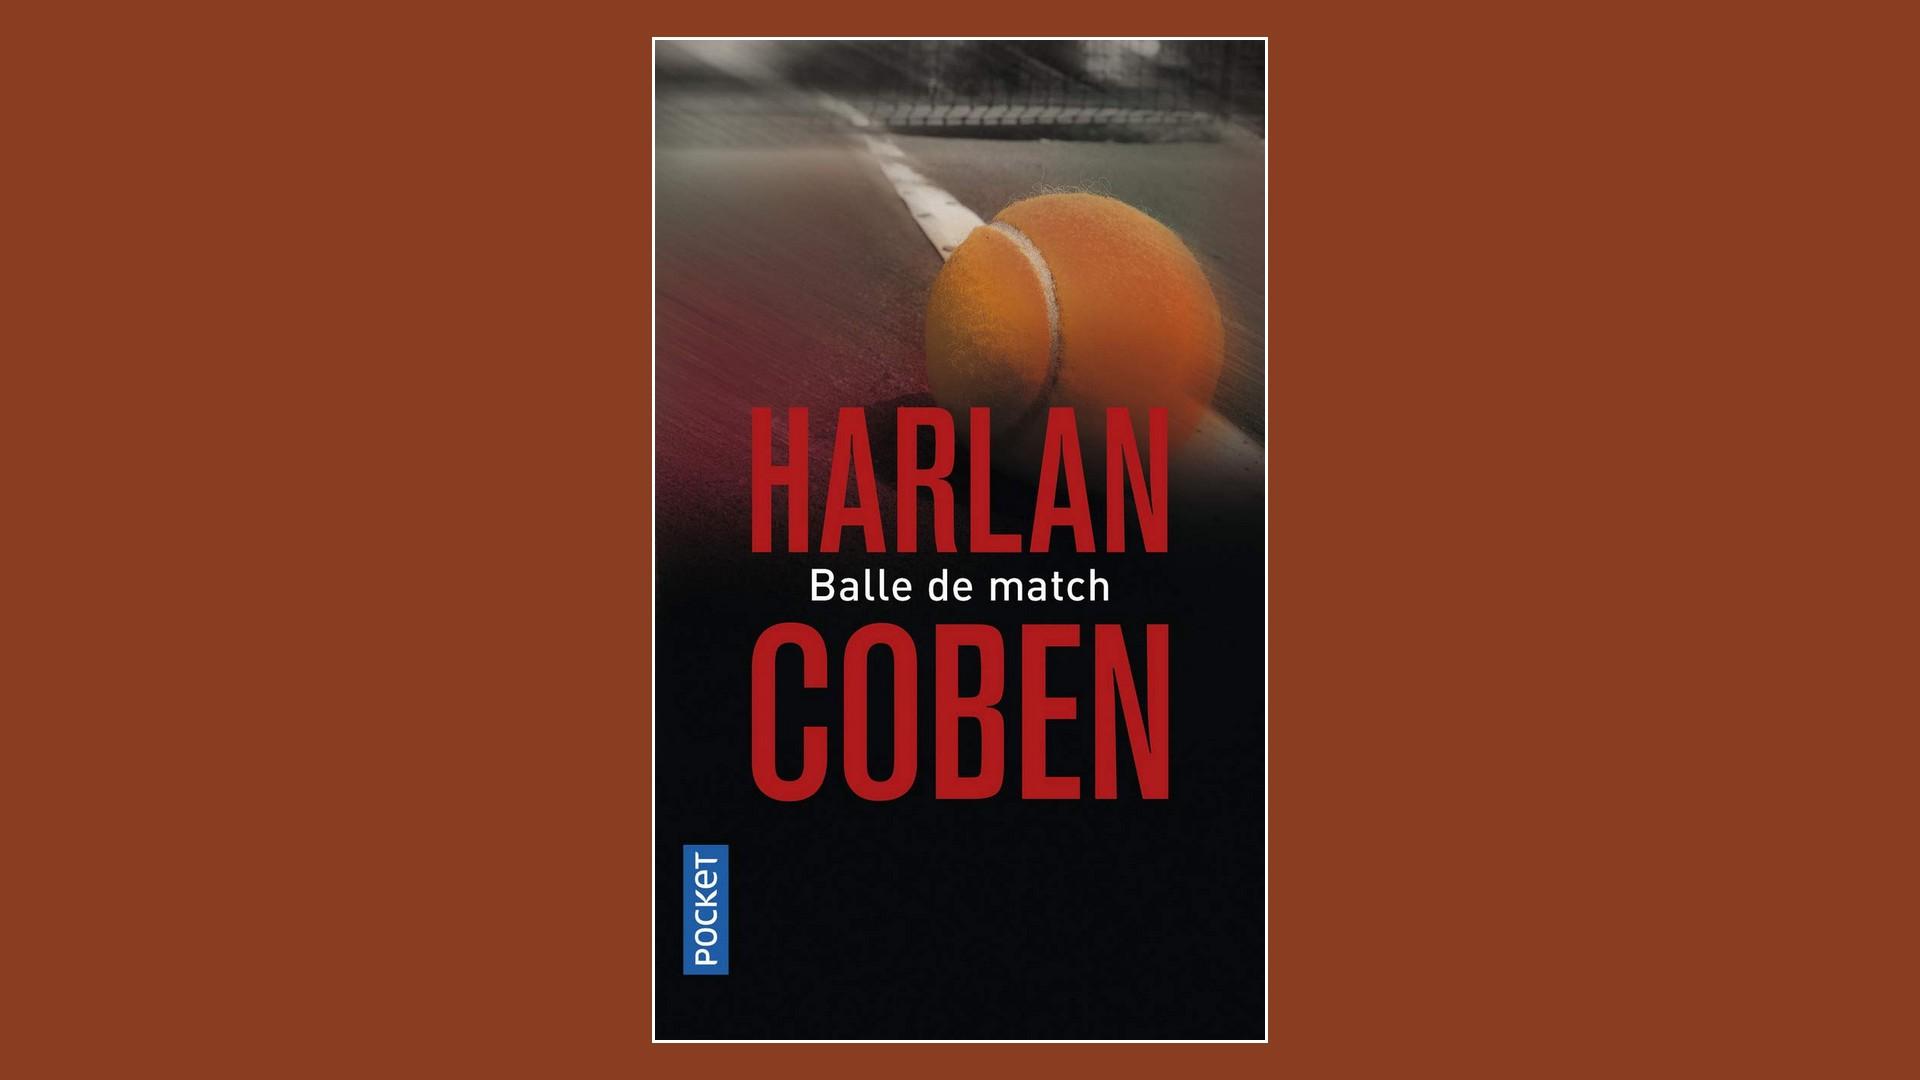 Livres – Balle de match – Harlan Coben (2011)